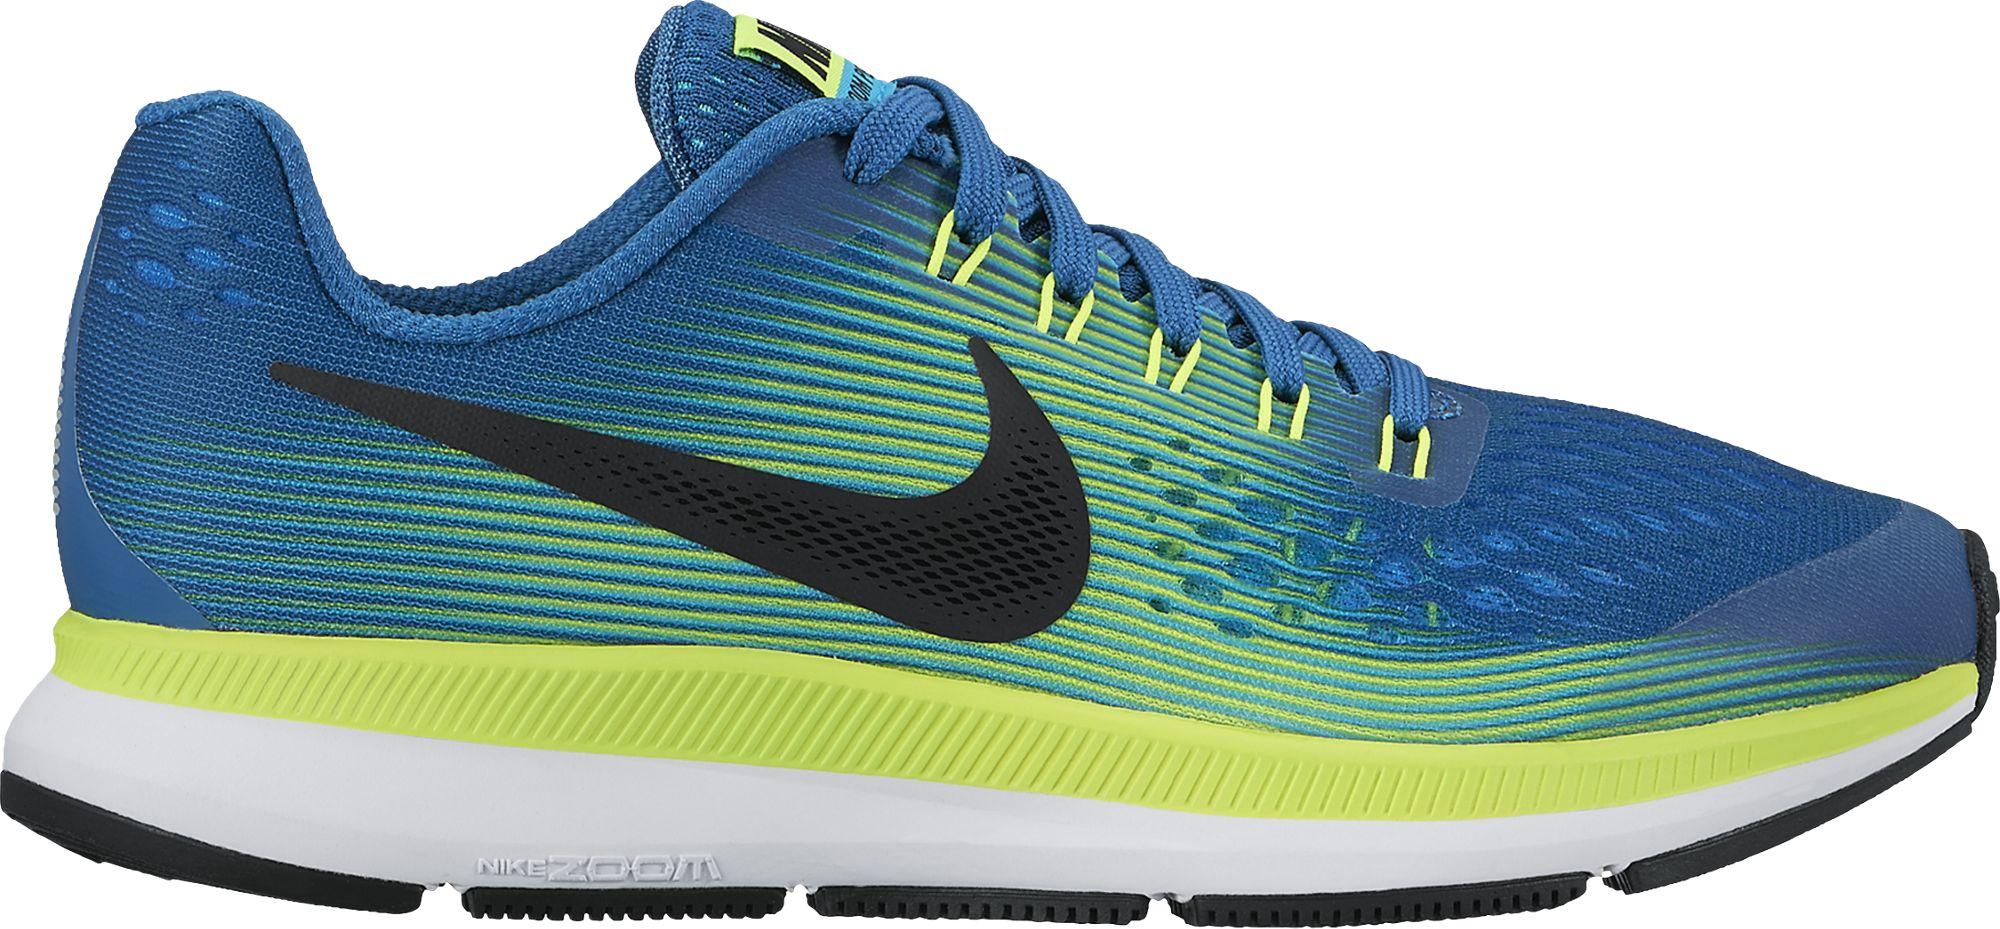 df9876ae5 Boy s Nike Zoom Pegasus 34 (GS) Running Shoe - Sieverts Sporting Goods